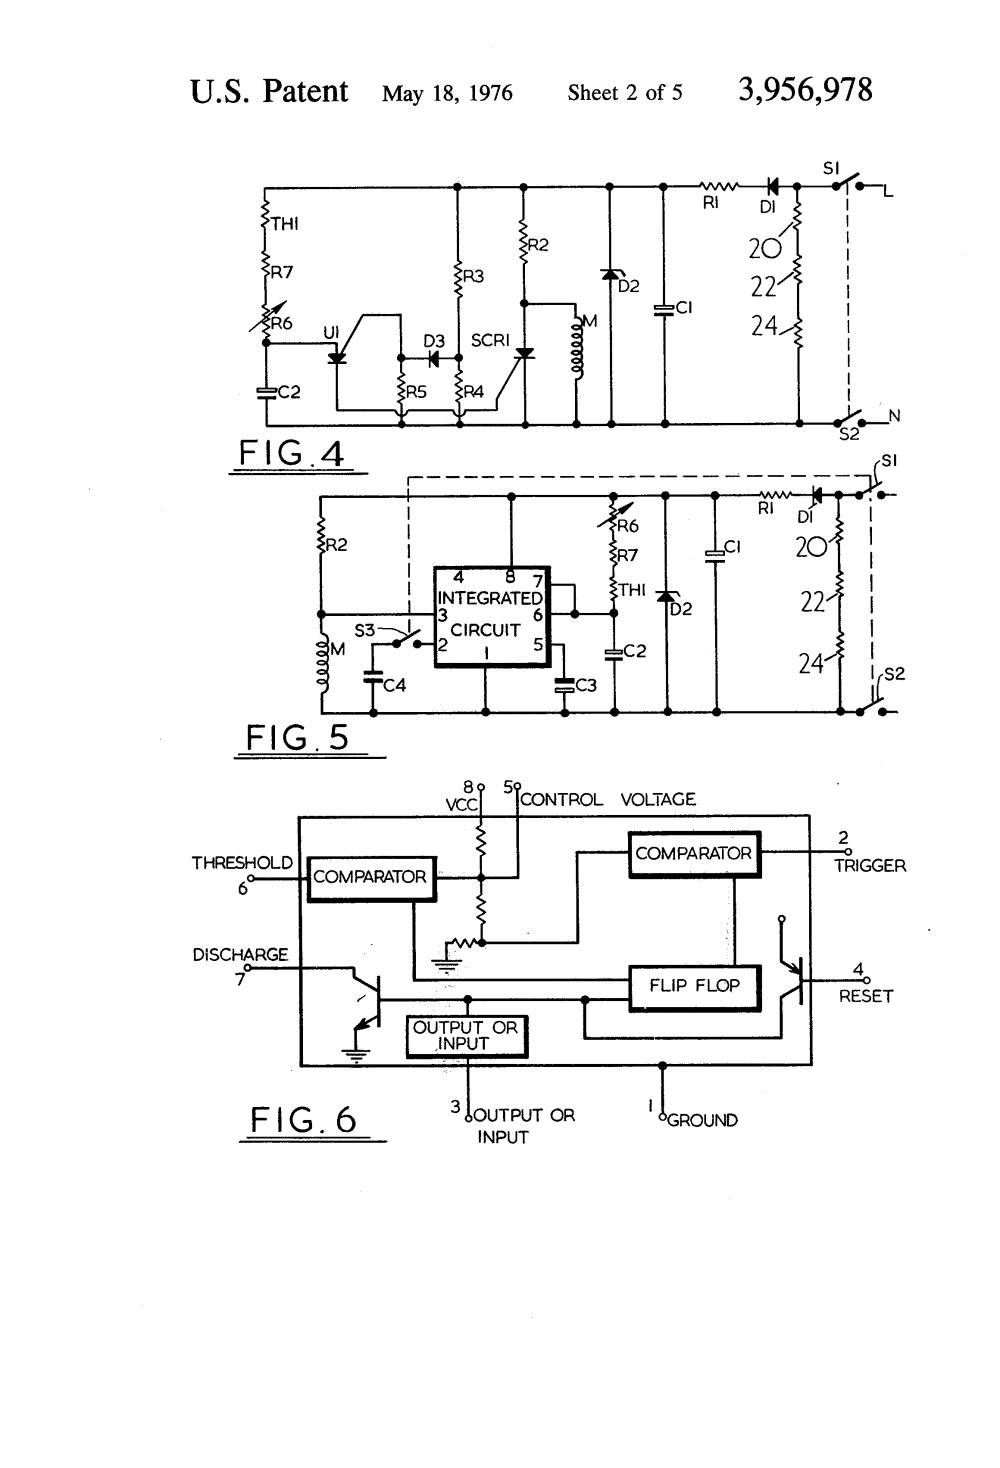 medium resolution of wiring diagram black desker toaster oven 40 wiring oster toaster oven wiring diagram p bass wiring diagram